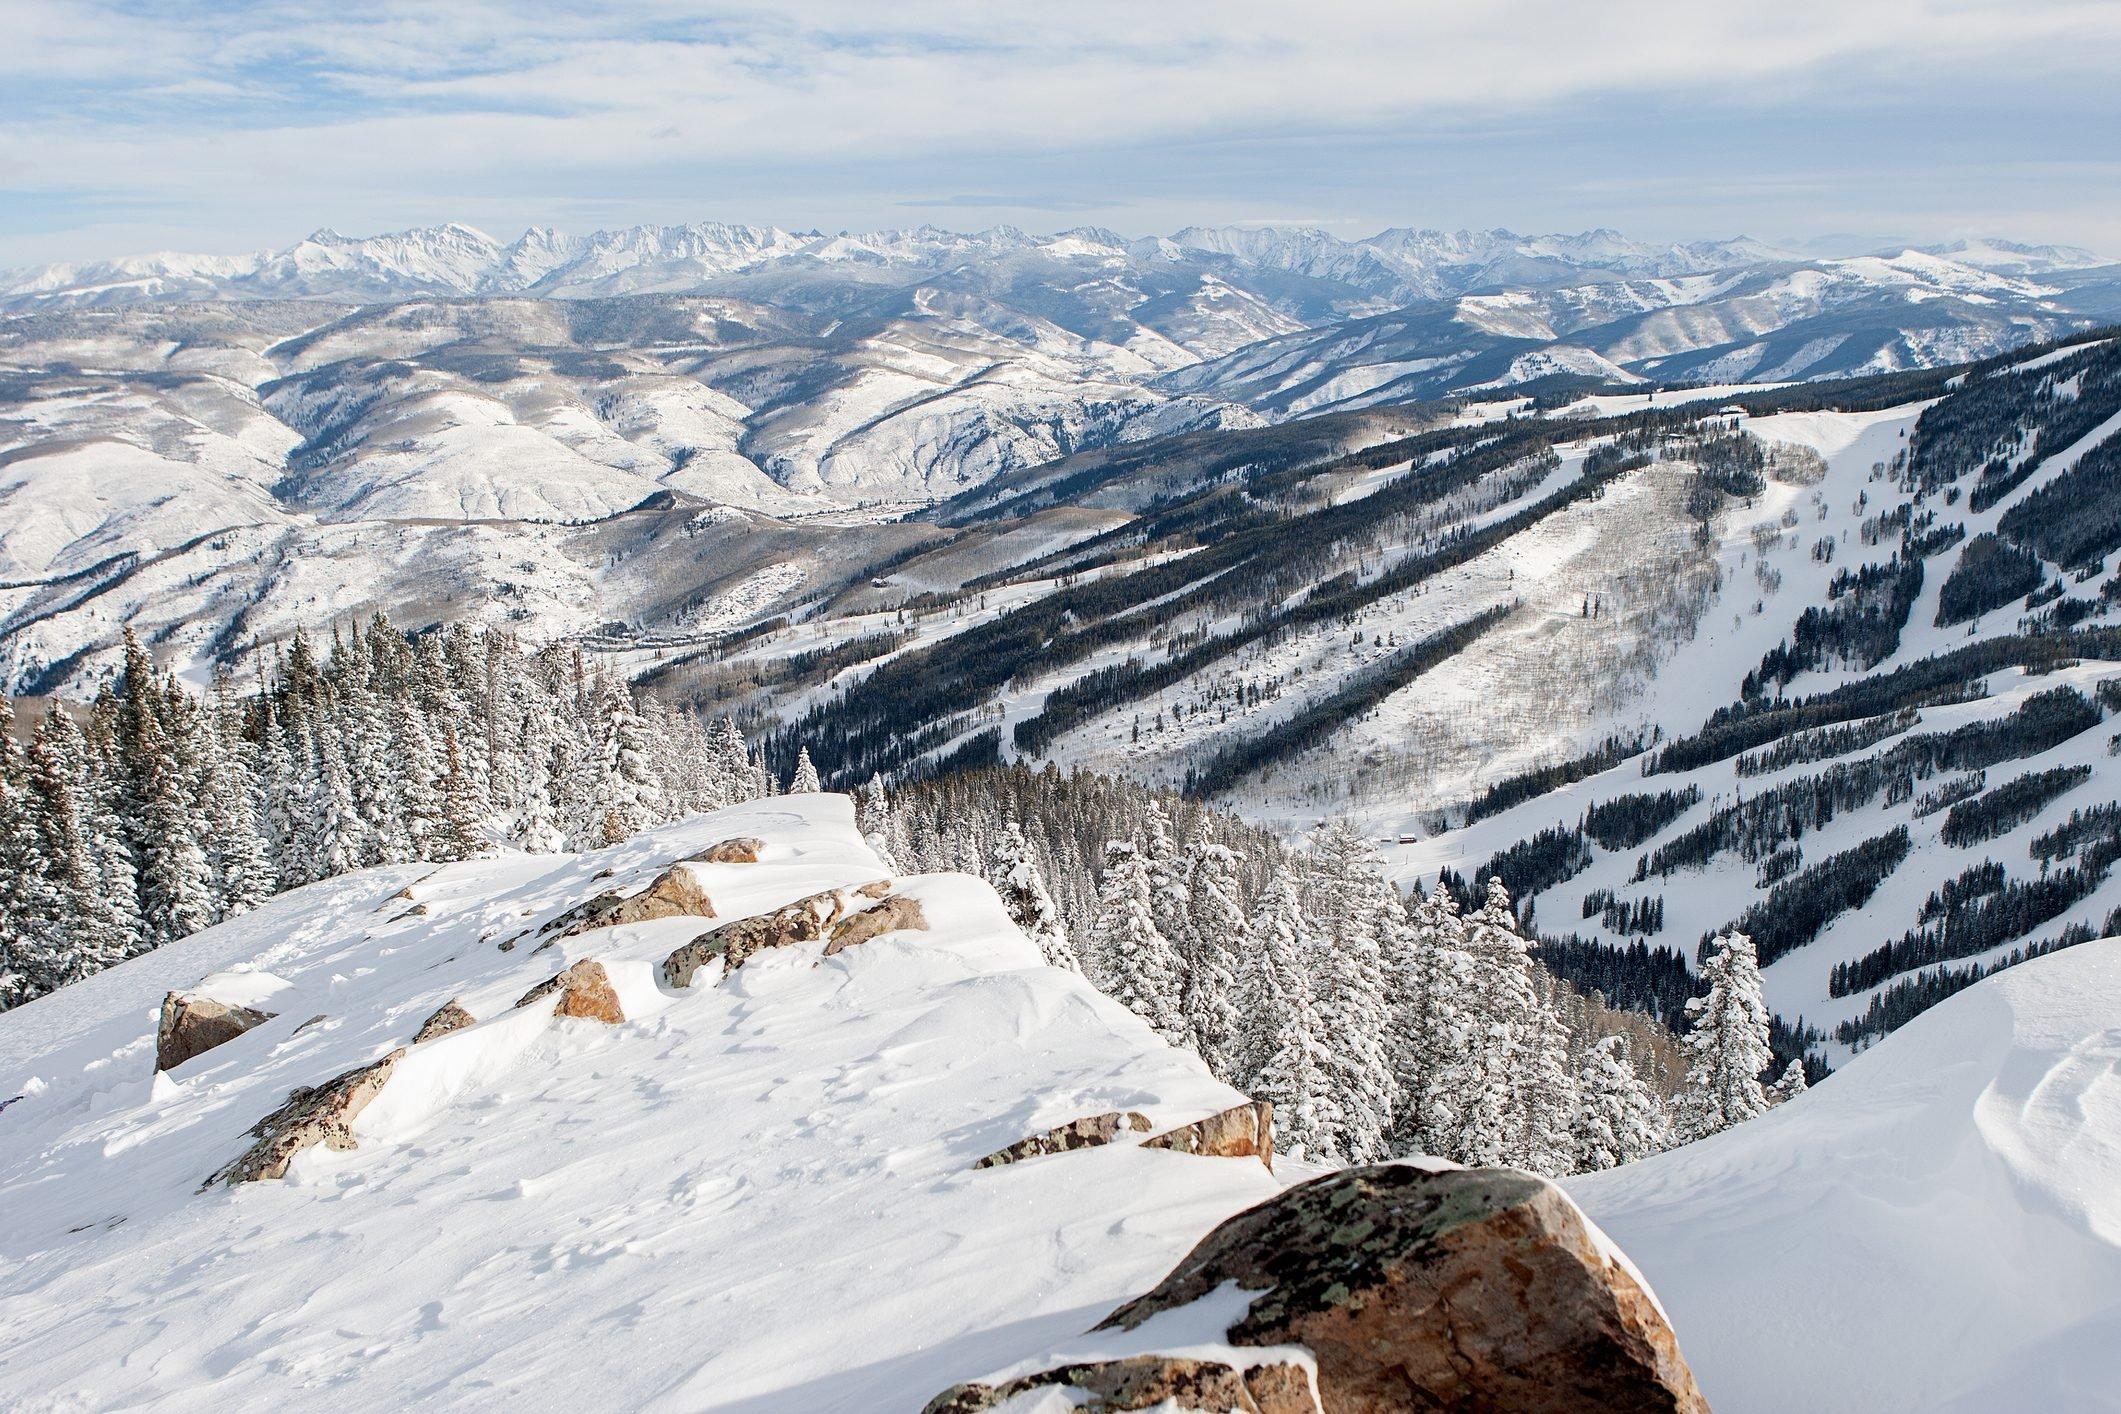 View of Beaver Creek Colorado.